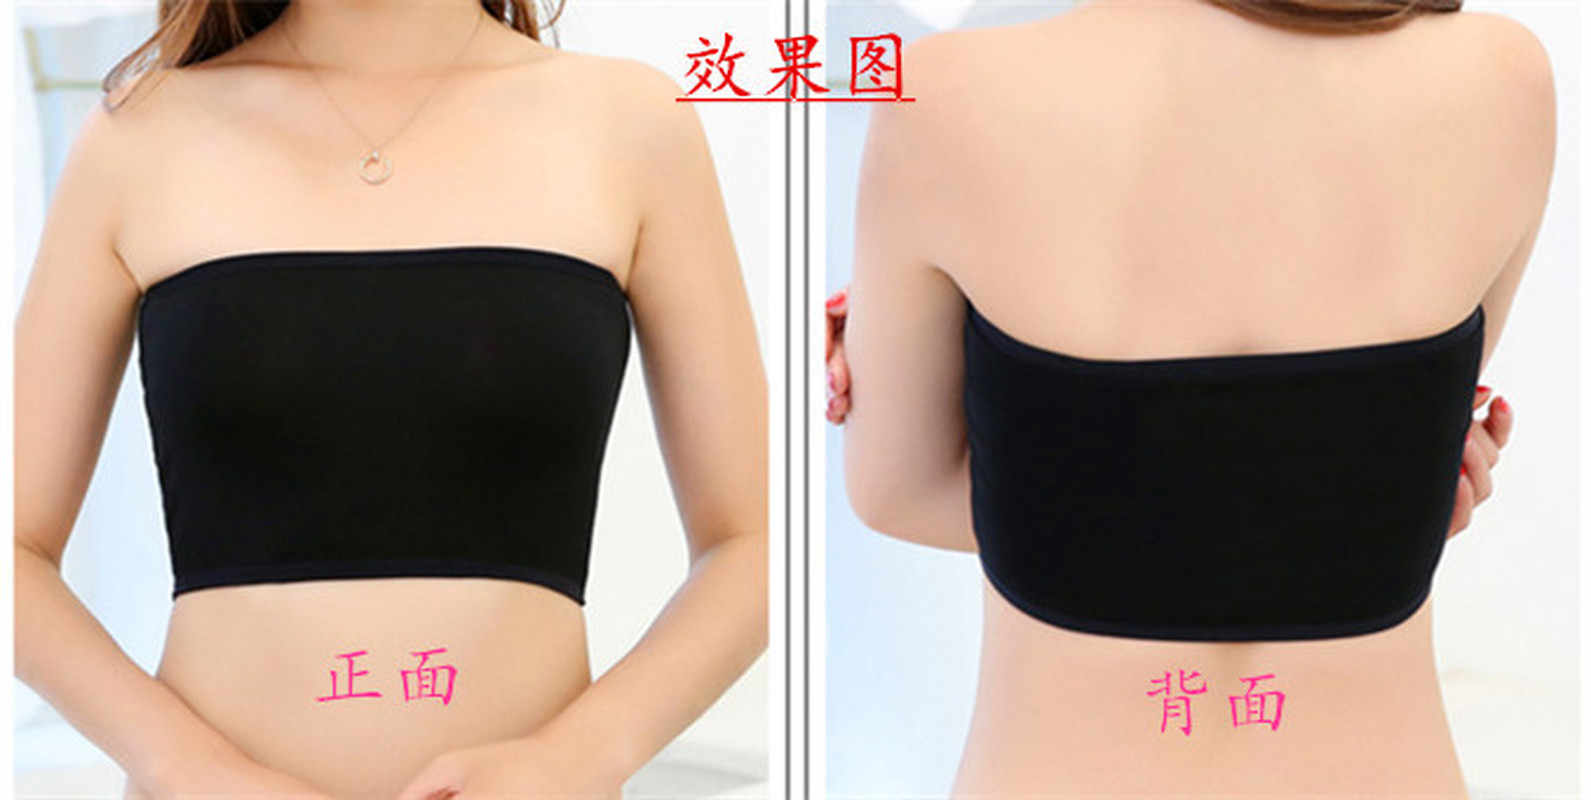 Basic Zwart Wit Skin Womens Plus Size Strapless UnPadded Beha Bandeau Tube Tops Verwisselbare Pads Naadloze Crop Kleuren